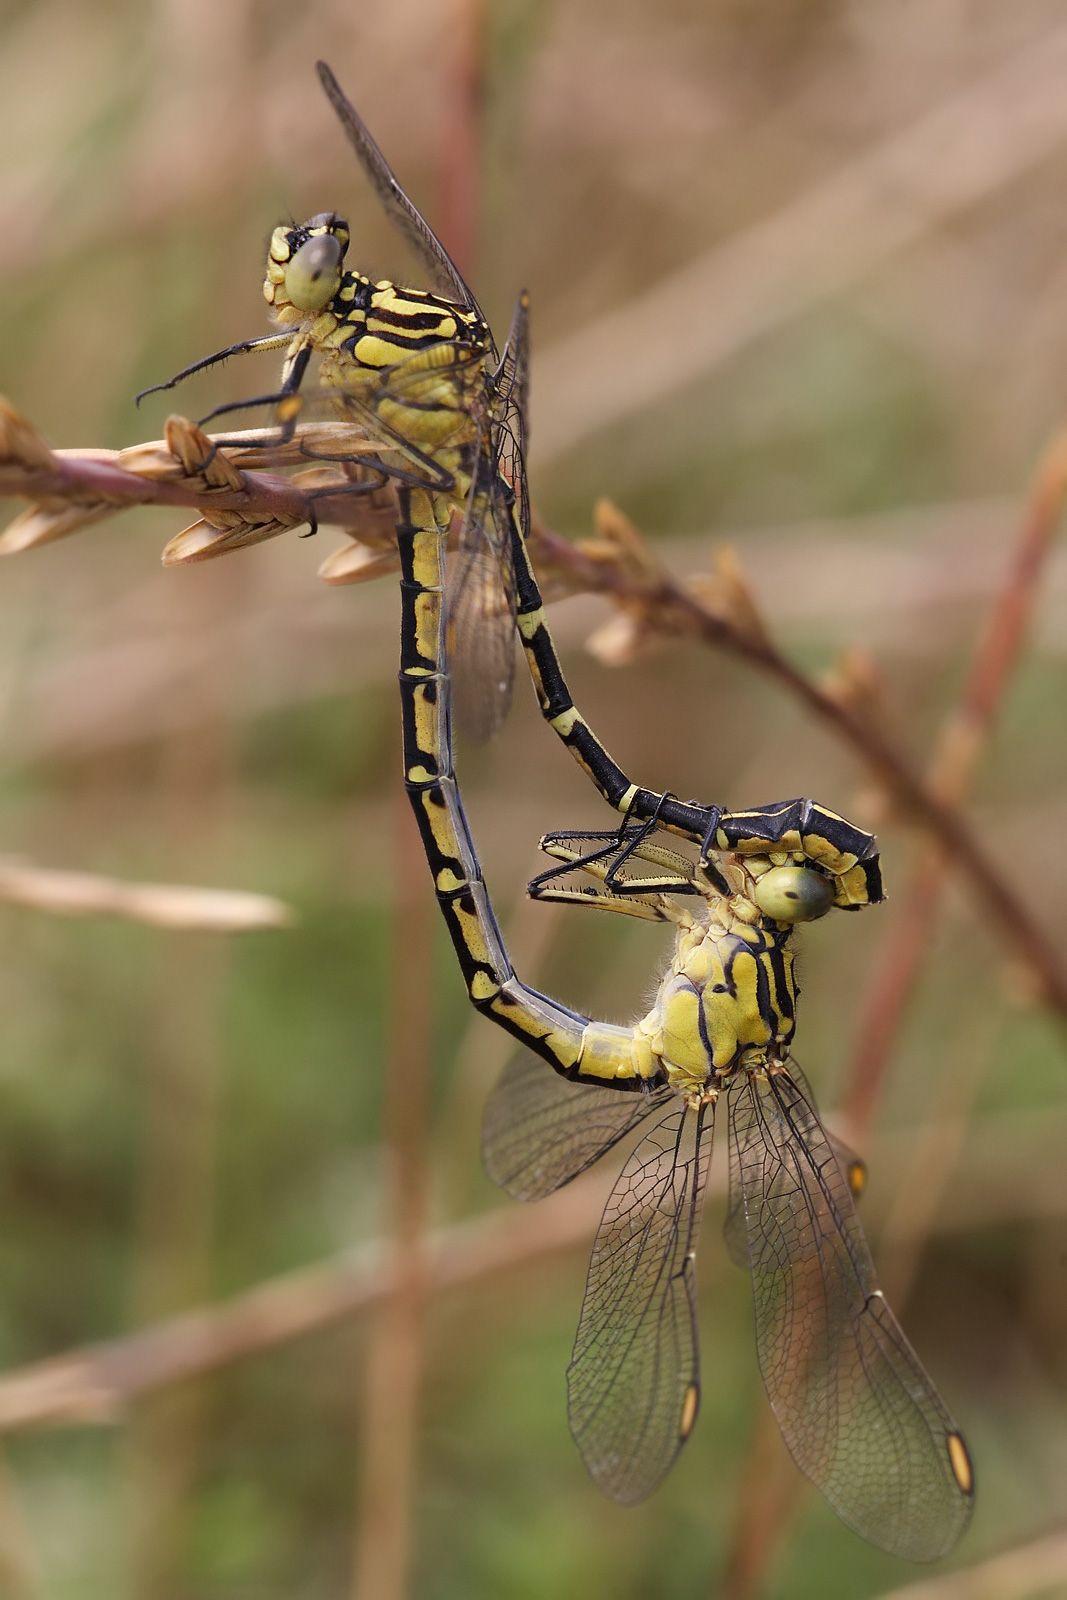 FileYellow striped hunter mating.jpg Macro photography